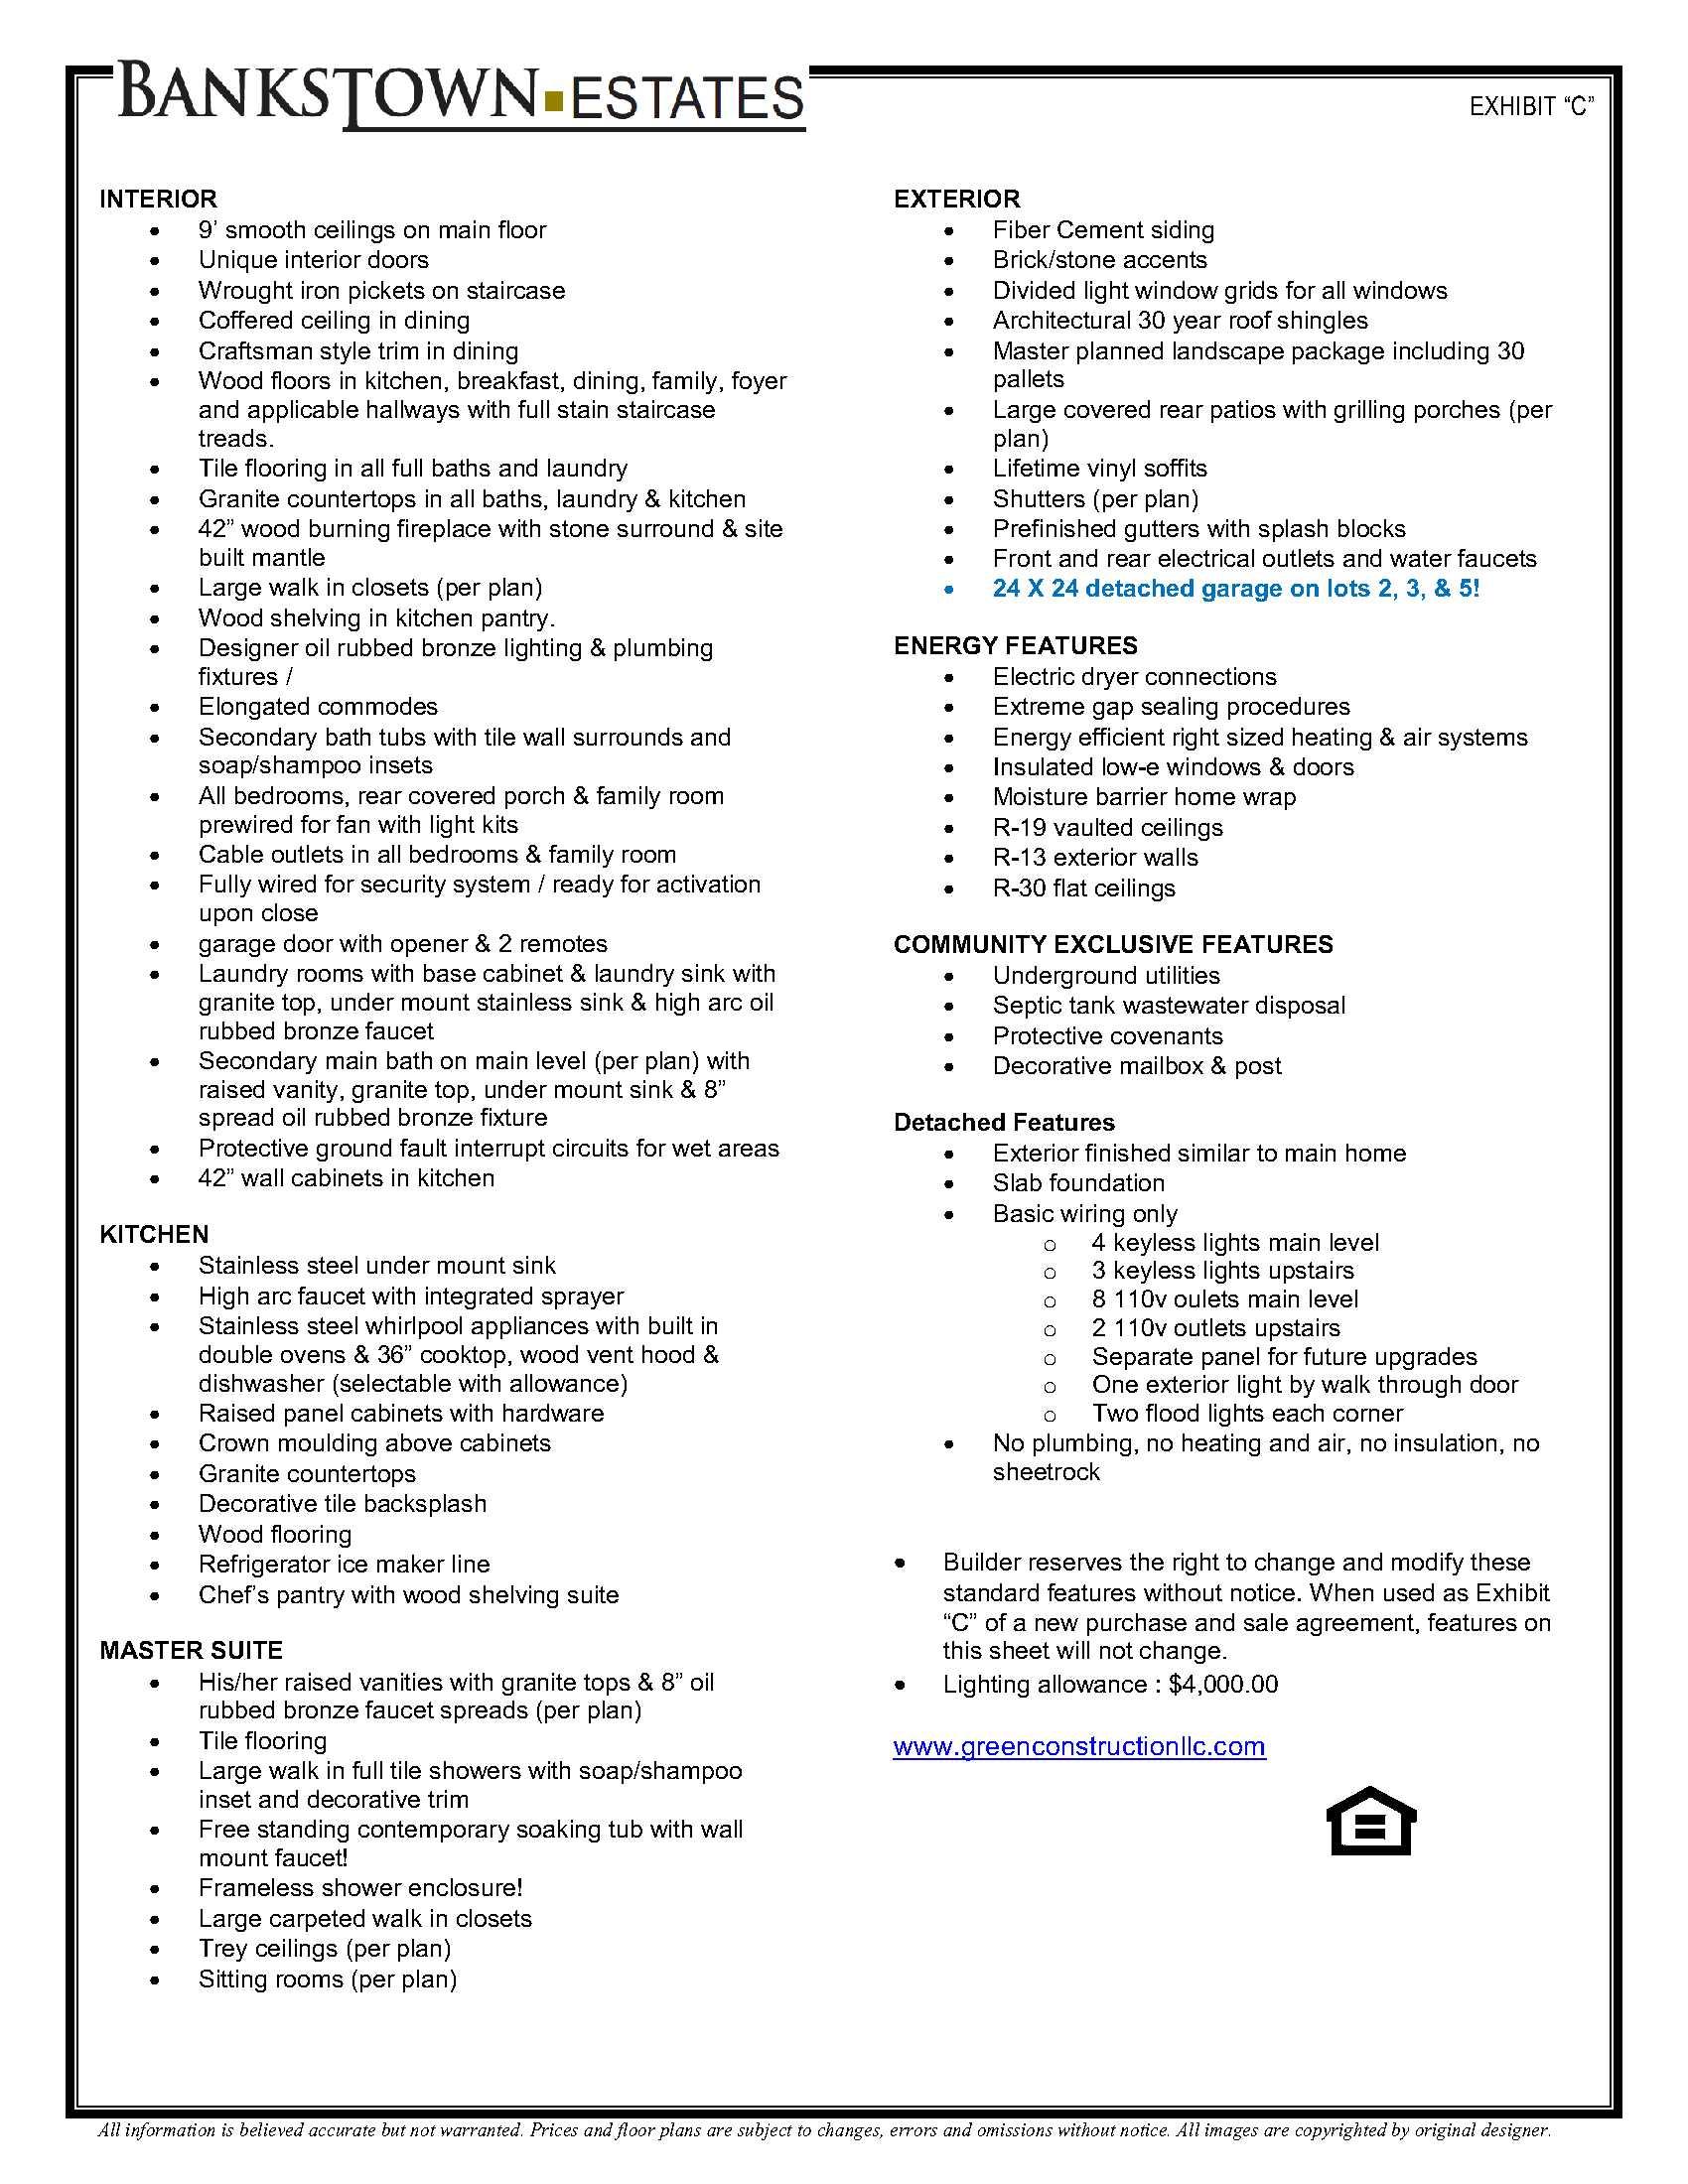 05.25.17 - Bankstown Estates Standard Features.jpg